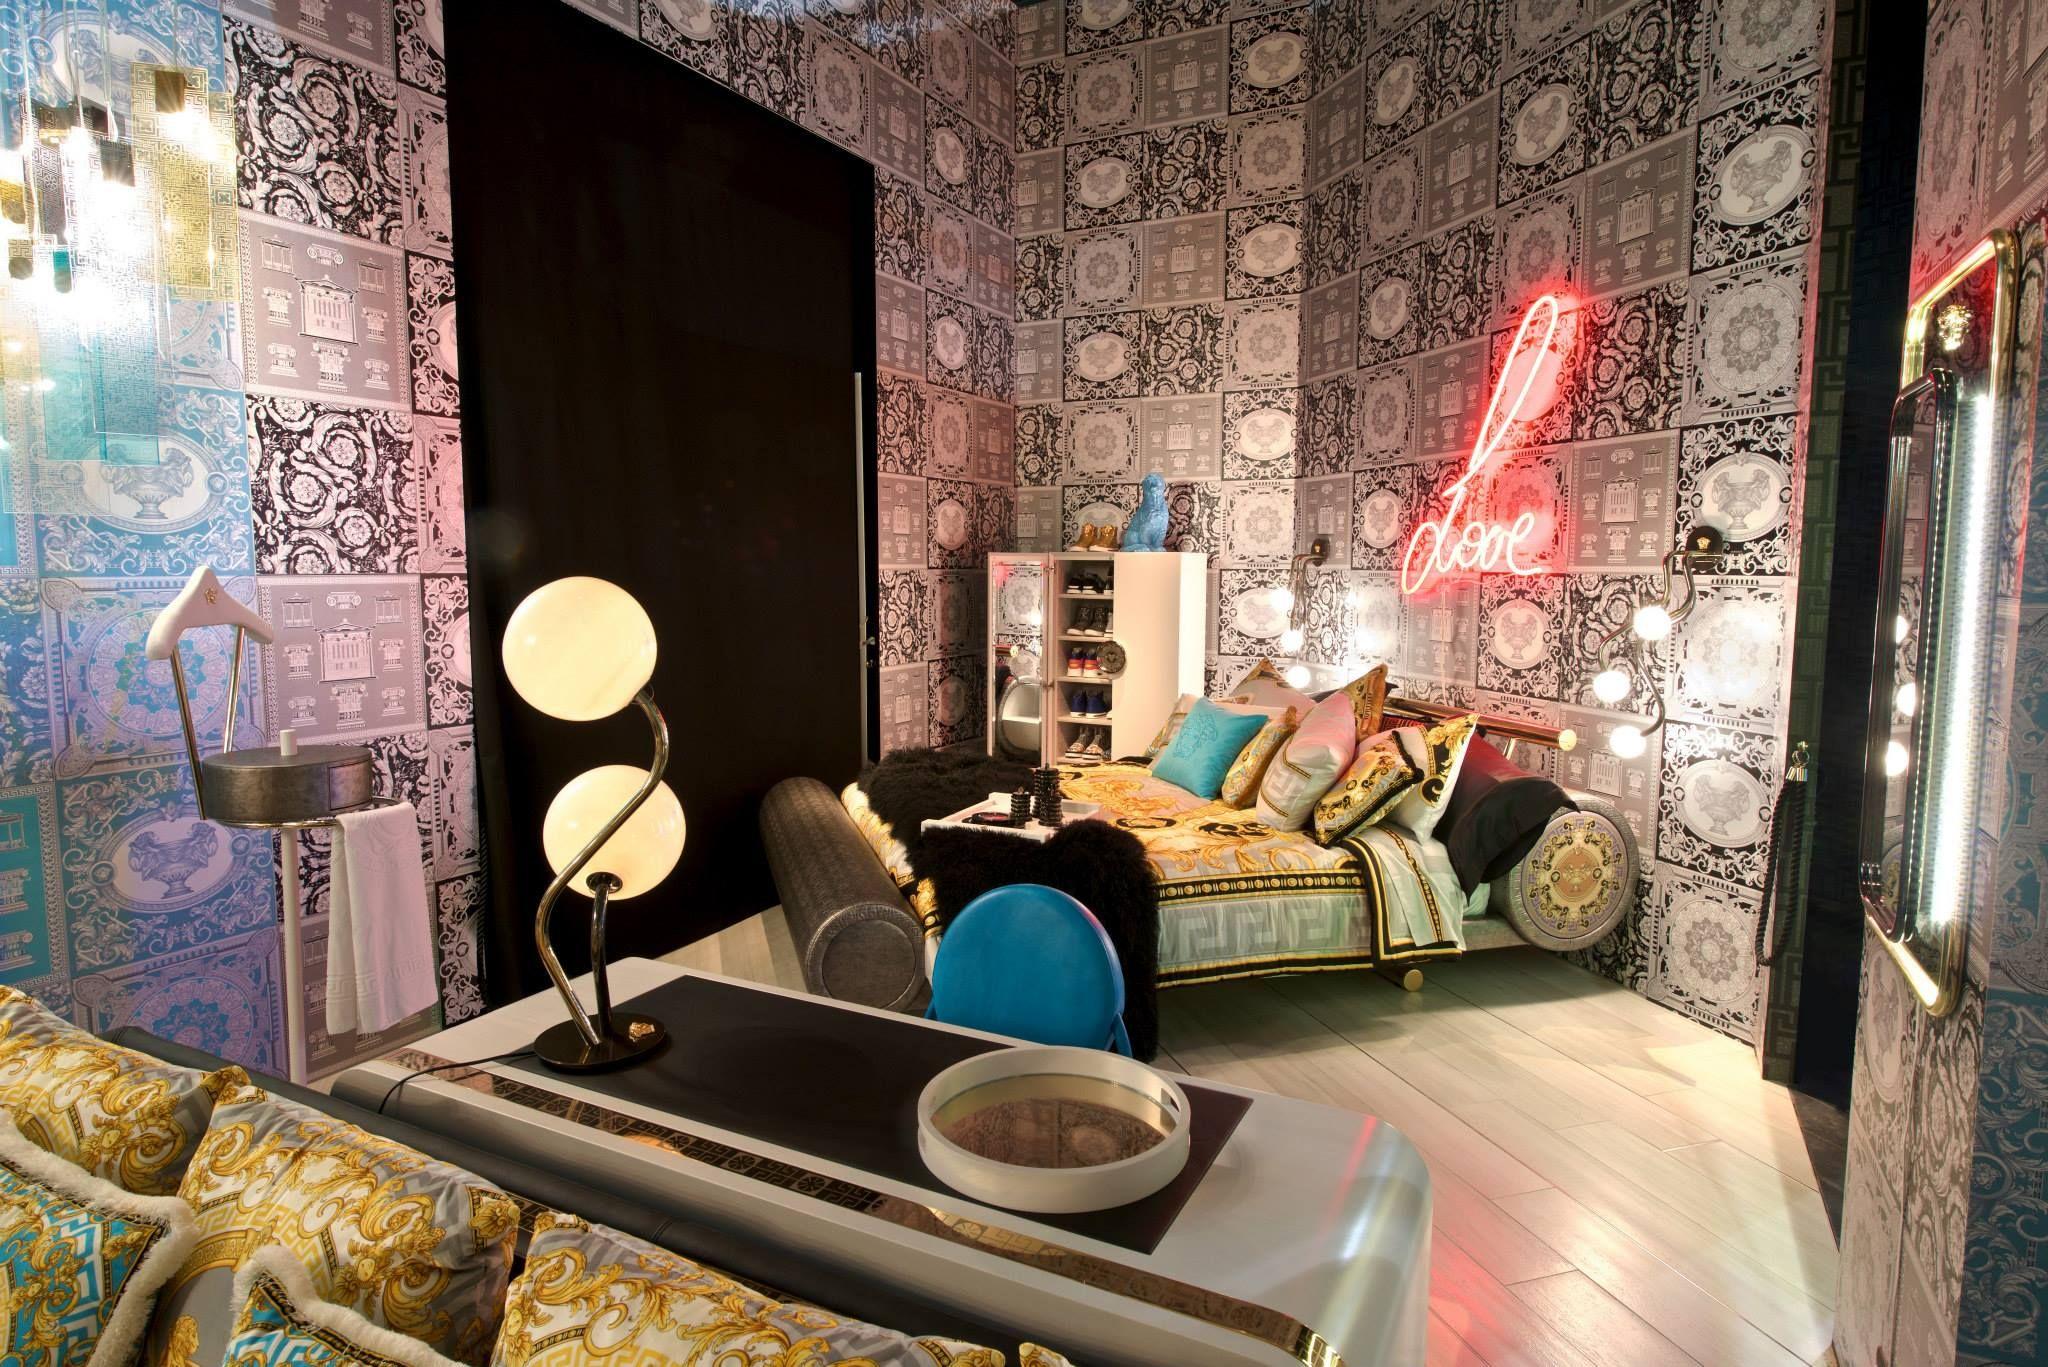 Schlafzimmer Versace ~ Schlafzimmer versace